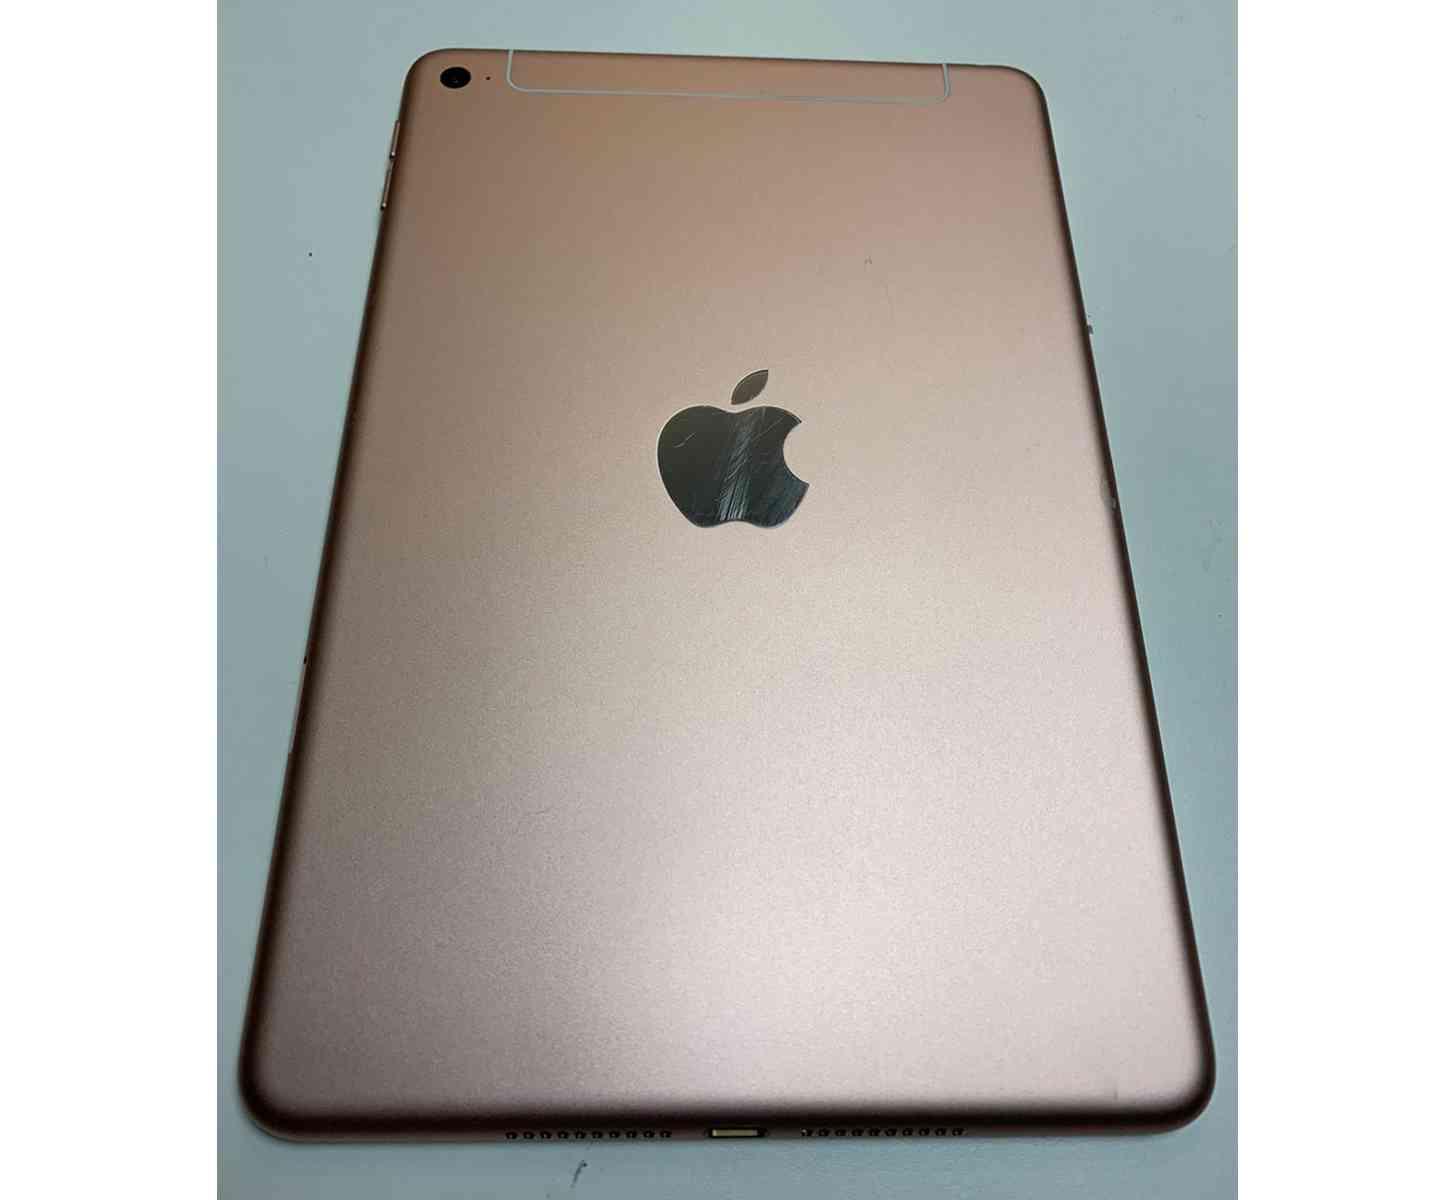 iPad mini 5 leak